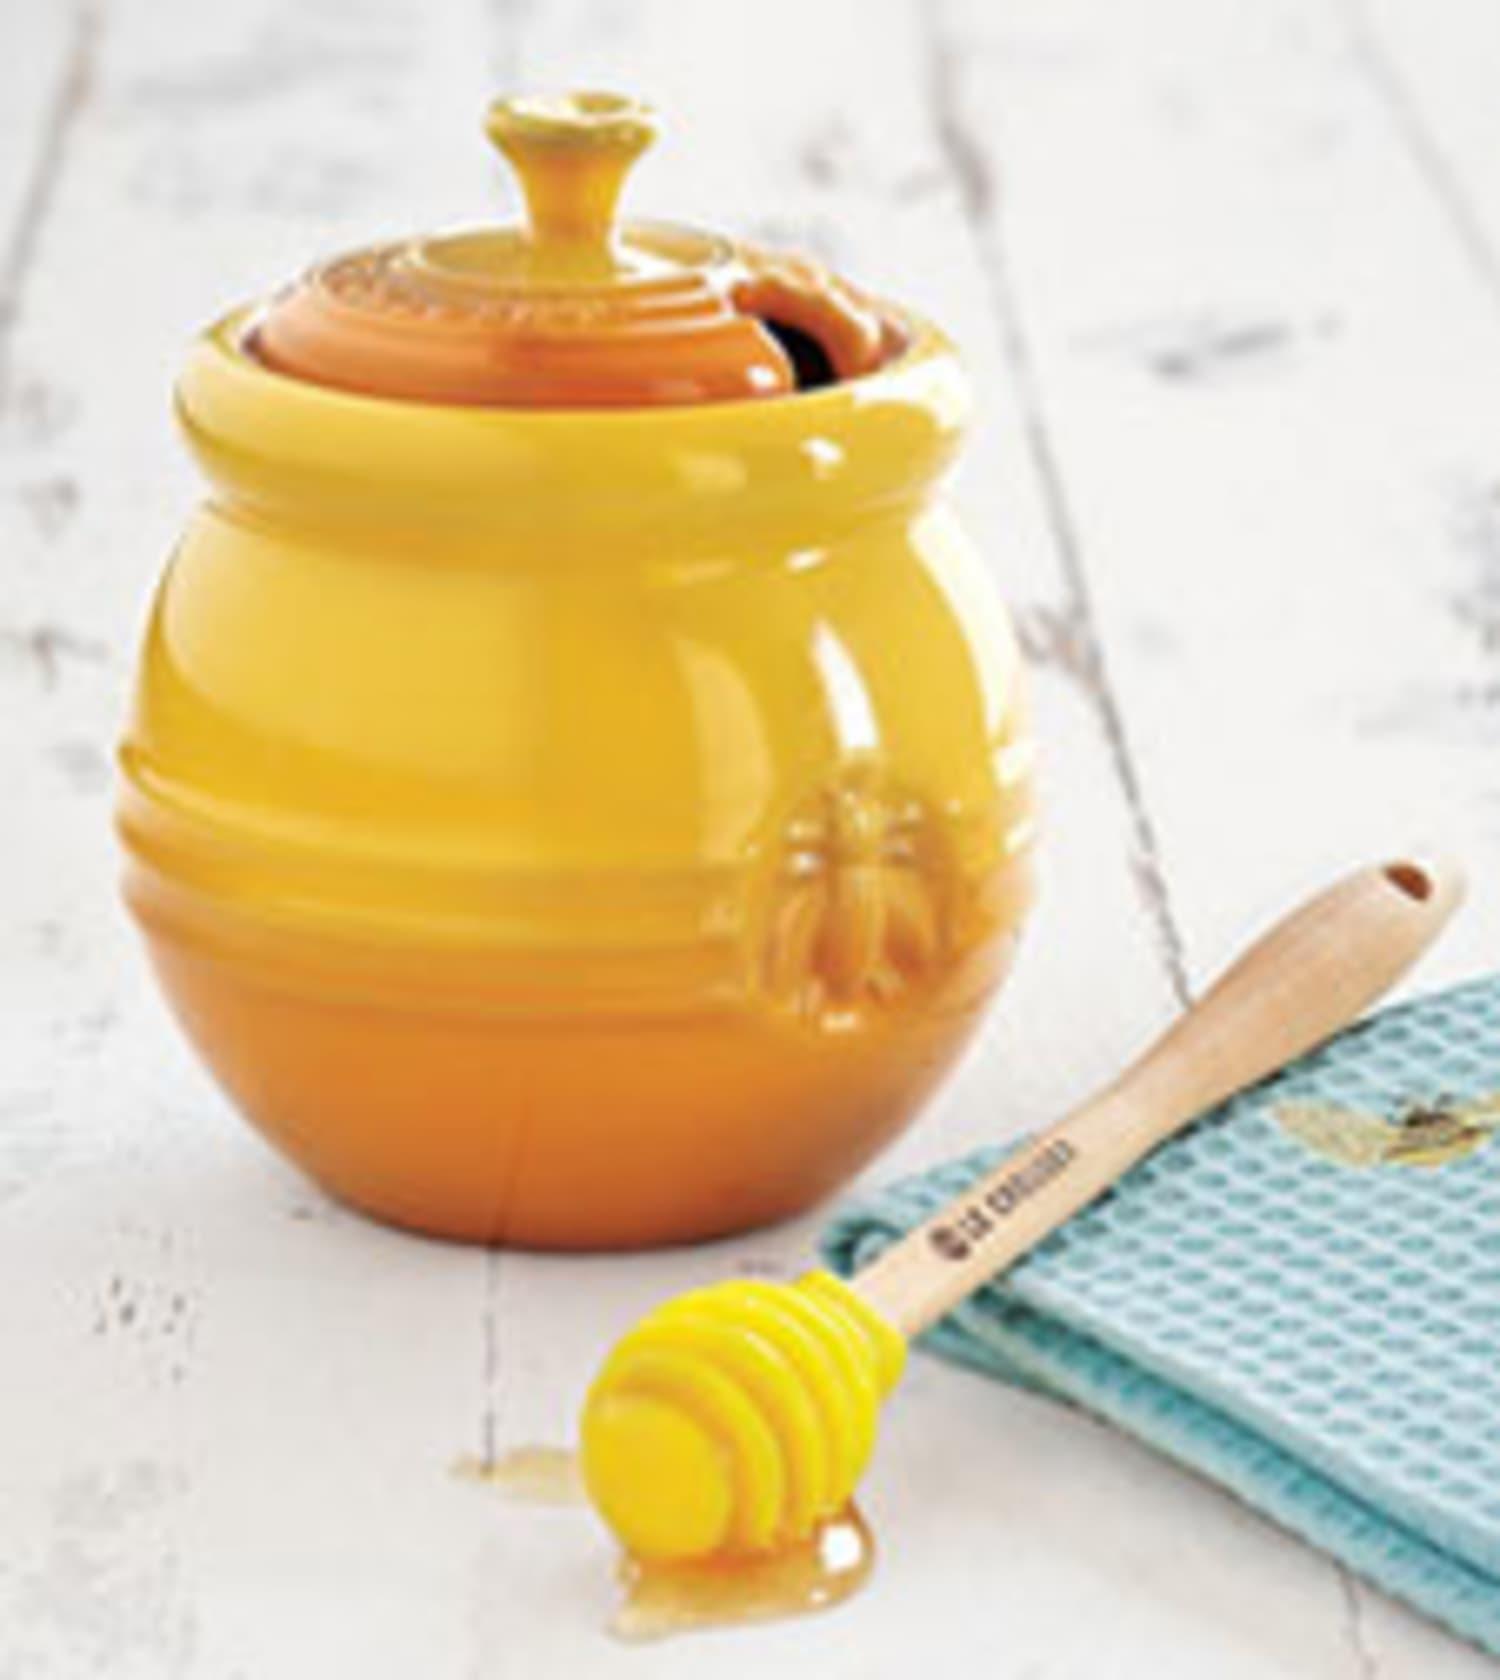 Find Me An Apartment: Help Me Find A Better Honey Pot